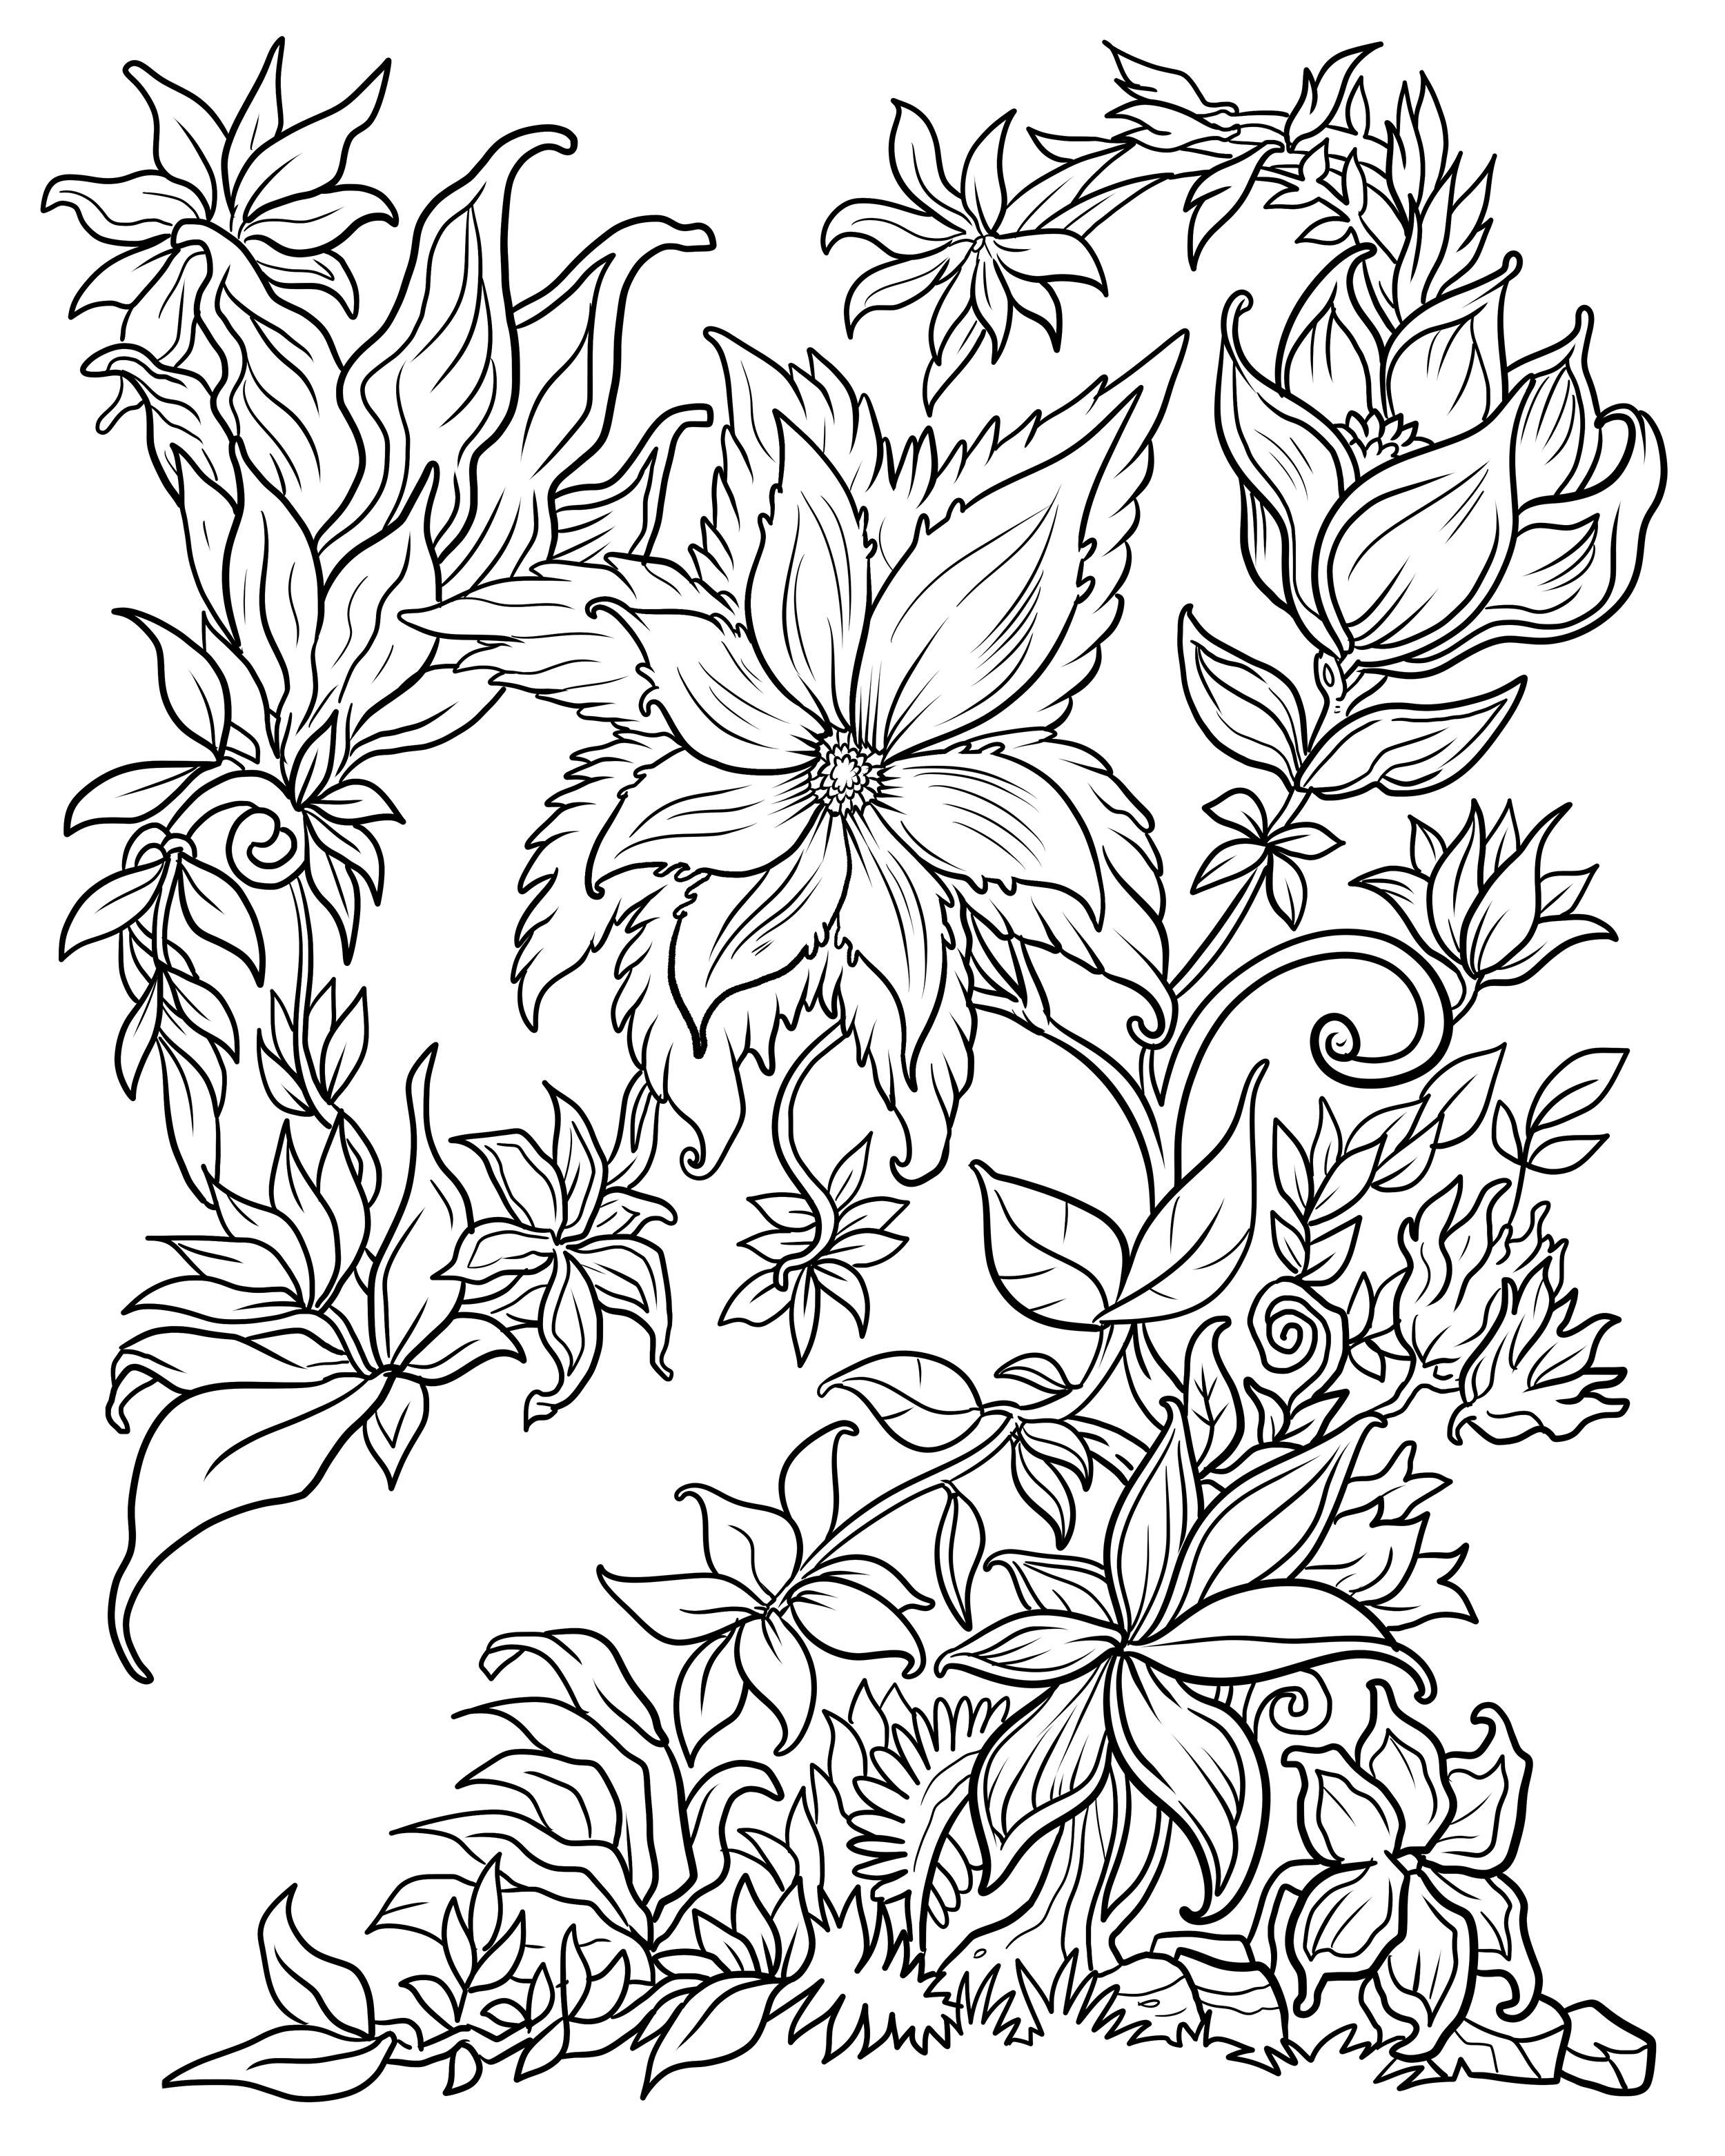 floral designs coloring book floral pattern coloring page free printable coloring pages floral coloring designs book